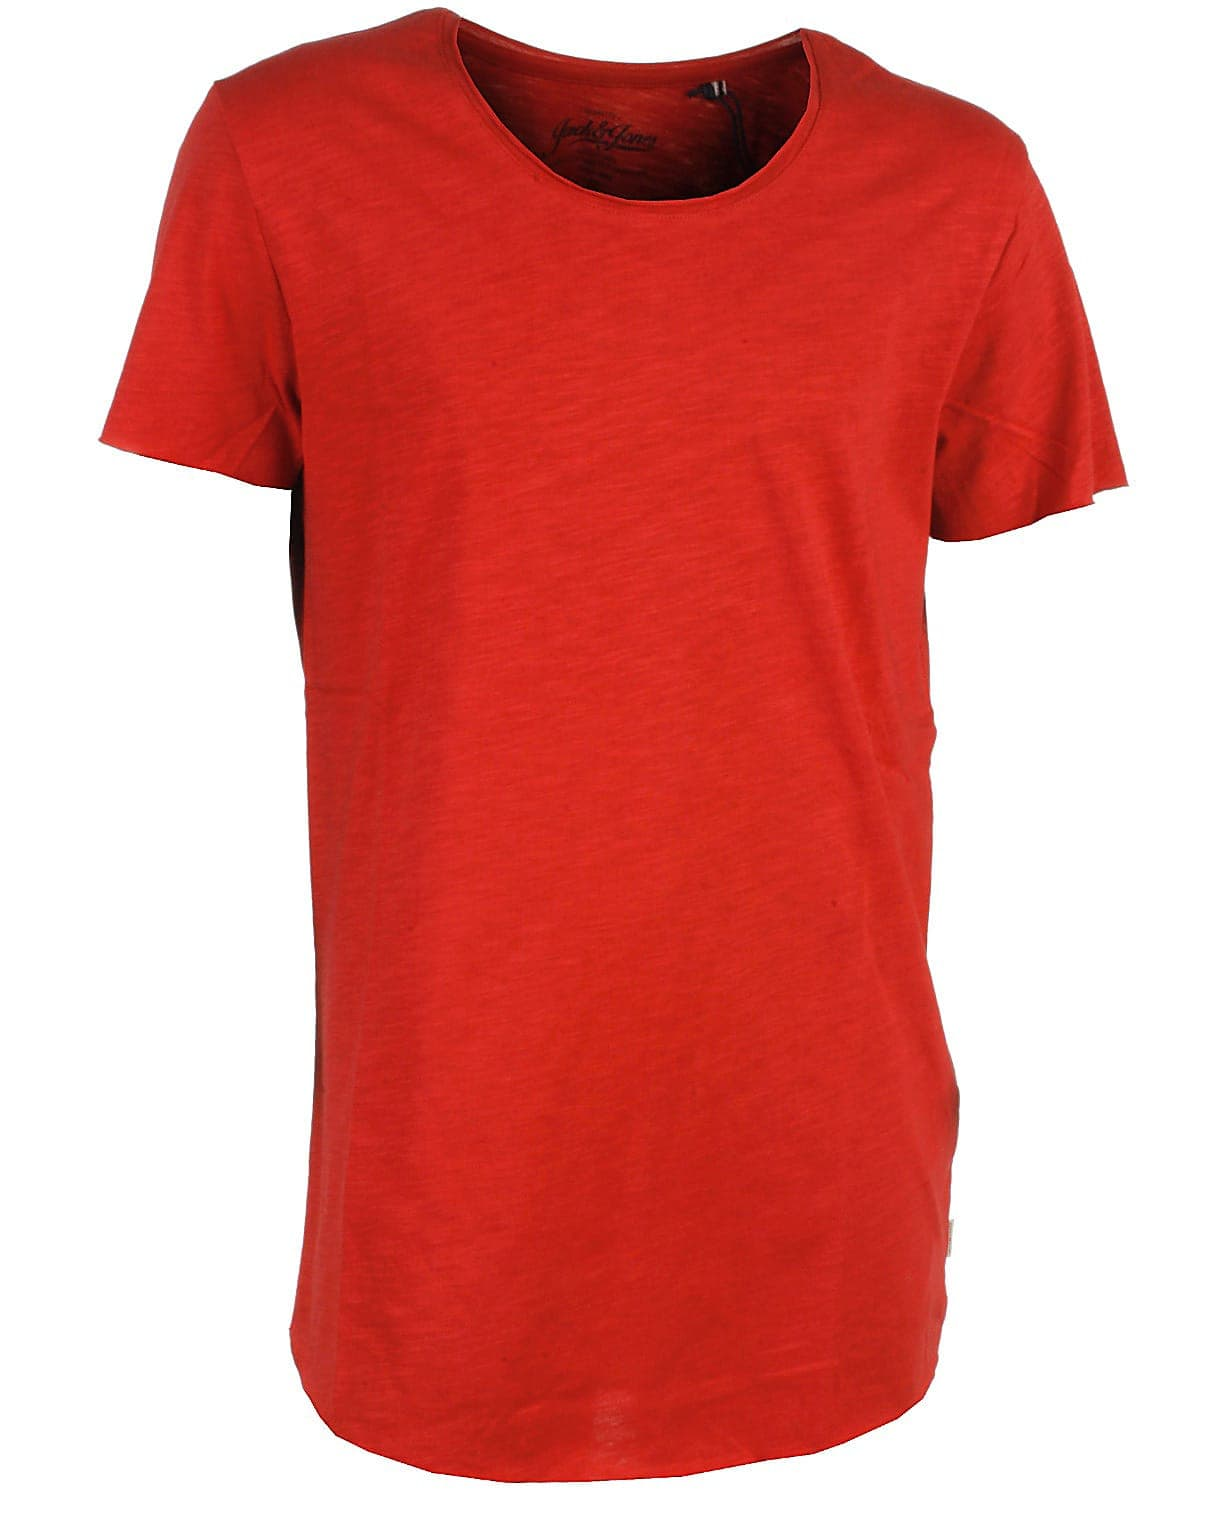 Image of Jack & Jones t-shirt s/s, rød, Bas